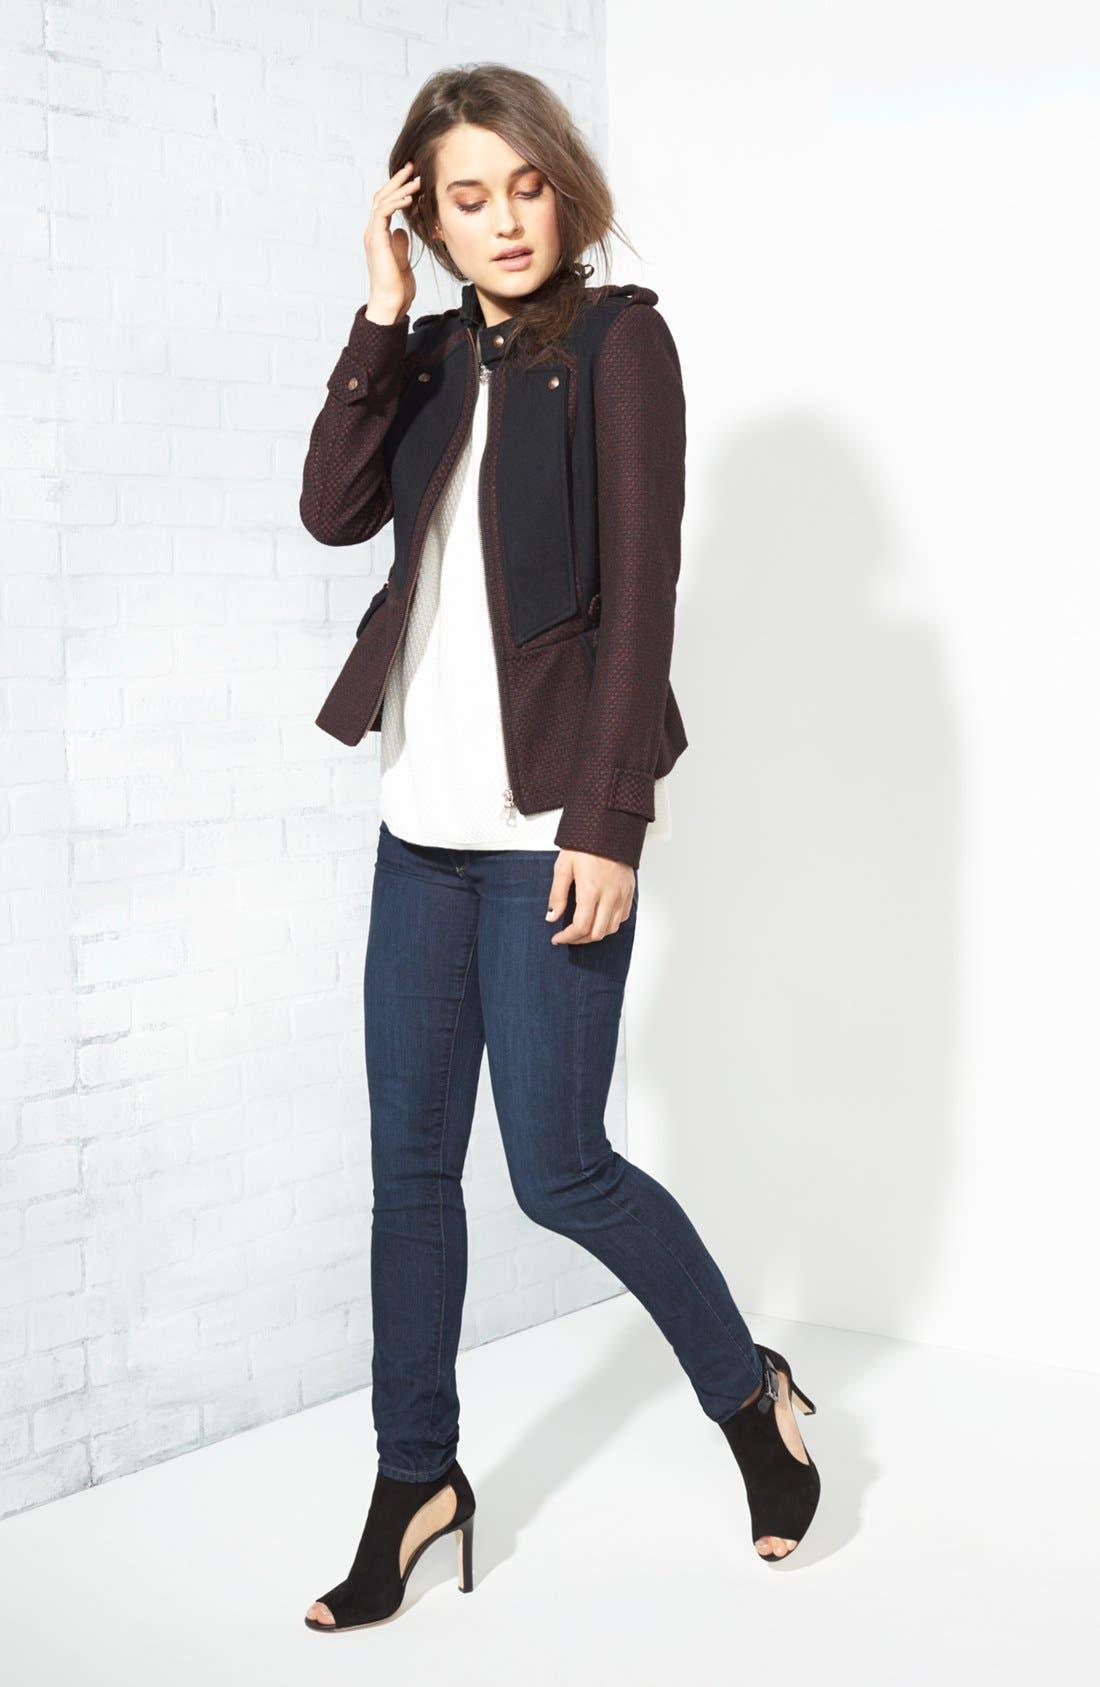 Main Image - Sam Edelman Jacket, Hinge® Sweater & Paige Denim Jeans